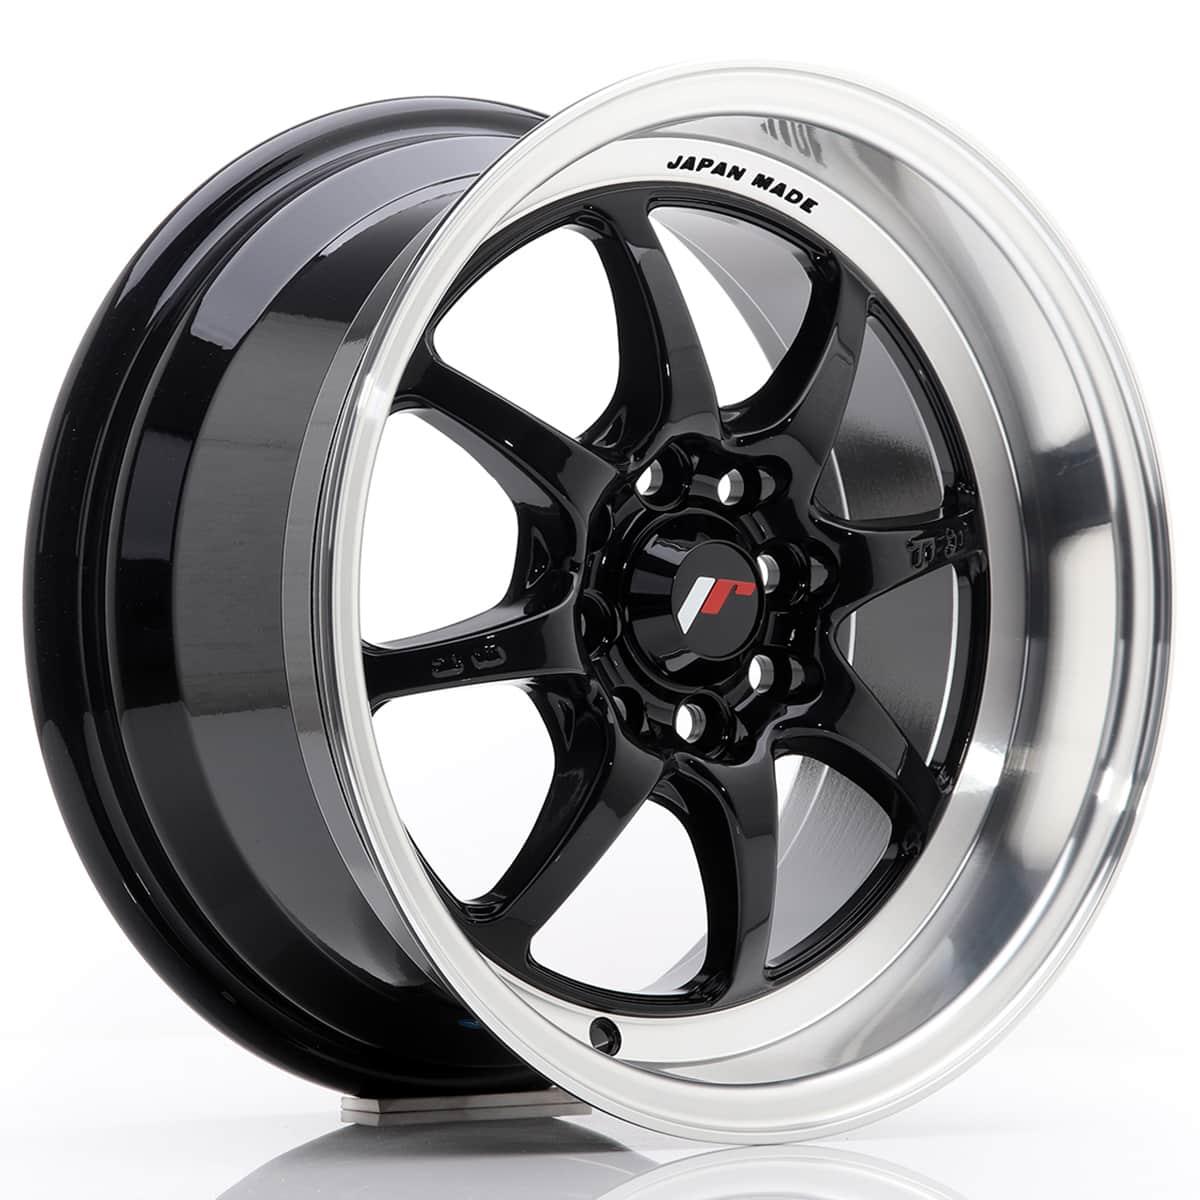 JR Wheels TF2 15x7, 5 ET30 4x100/114 Gloss Black